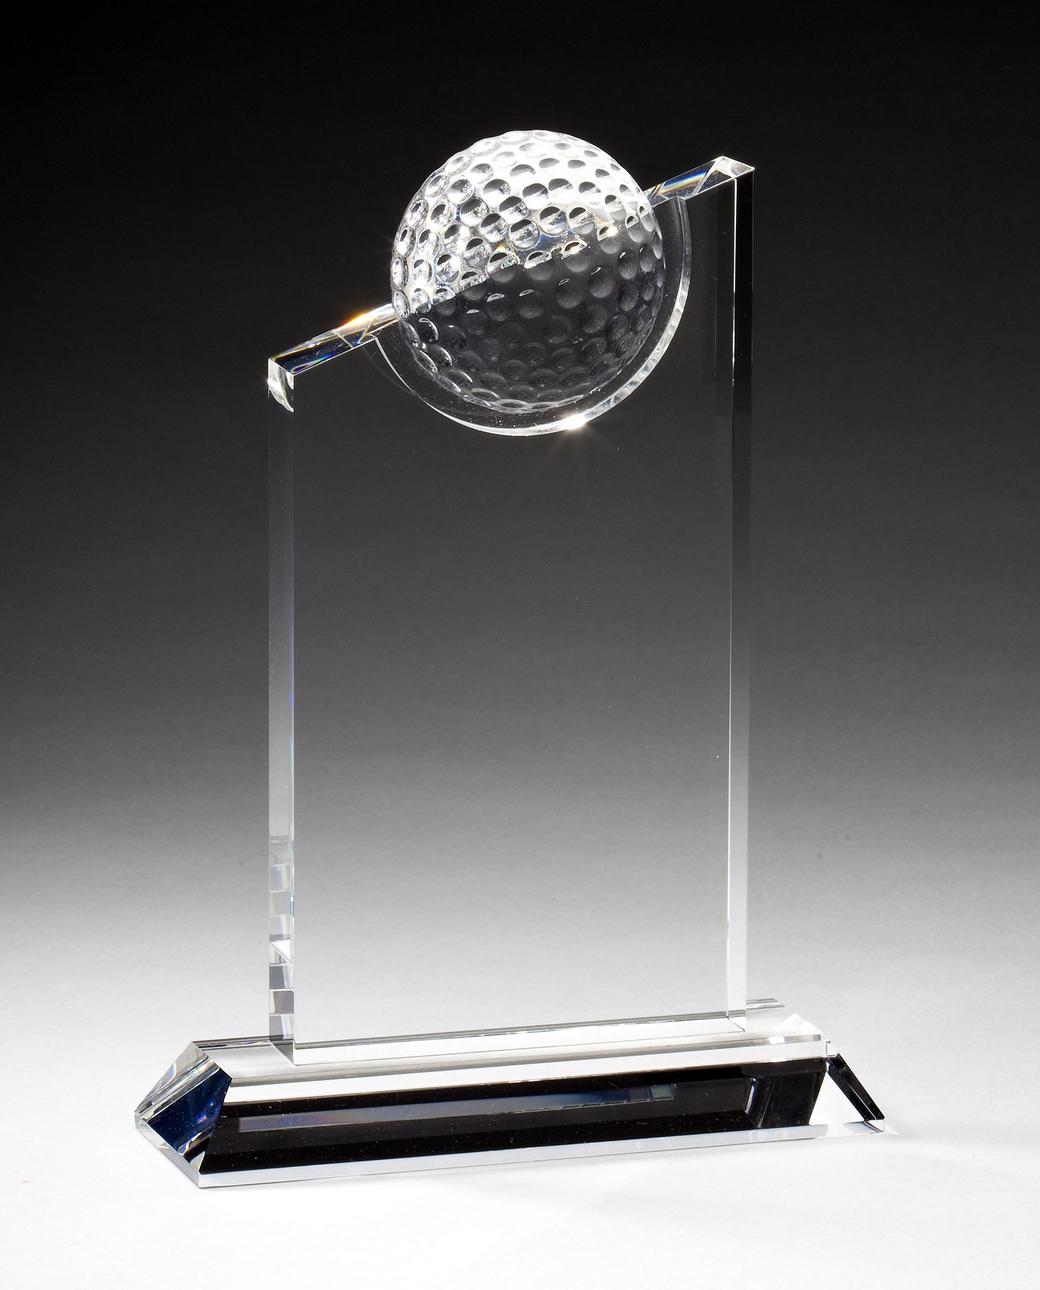 "Crystal Golf Peak    Large:  CRY182 - 9.5"" tall x 6"" wide -  $105    Medium:  CRY181 - 8"" tall x 6"" wide -  $92    Small:  CRY180 - 7.25"" tall x 5.5"" wide -  $85"